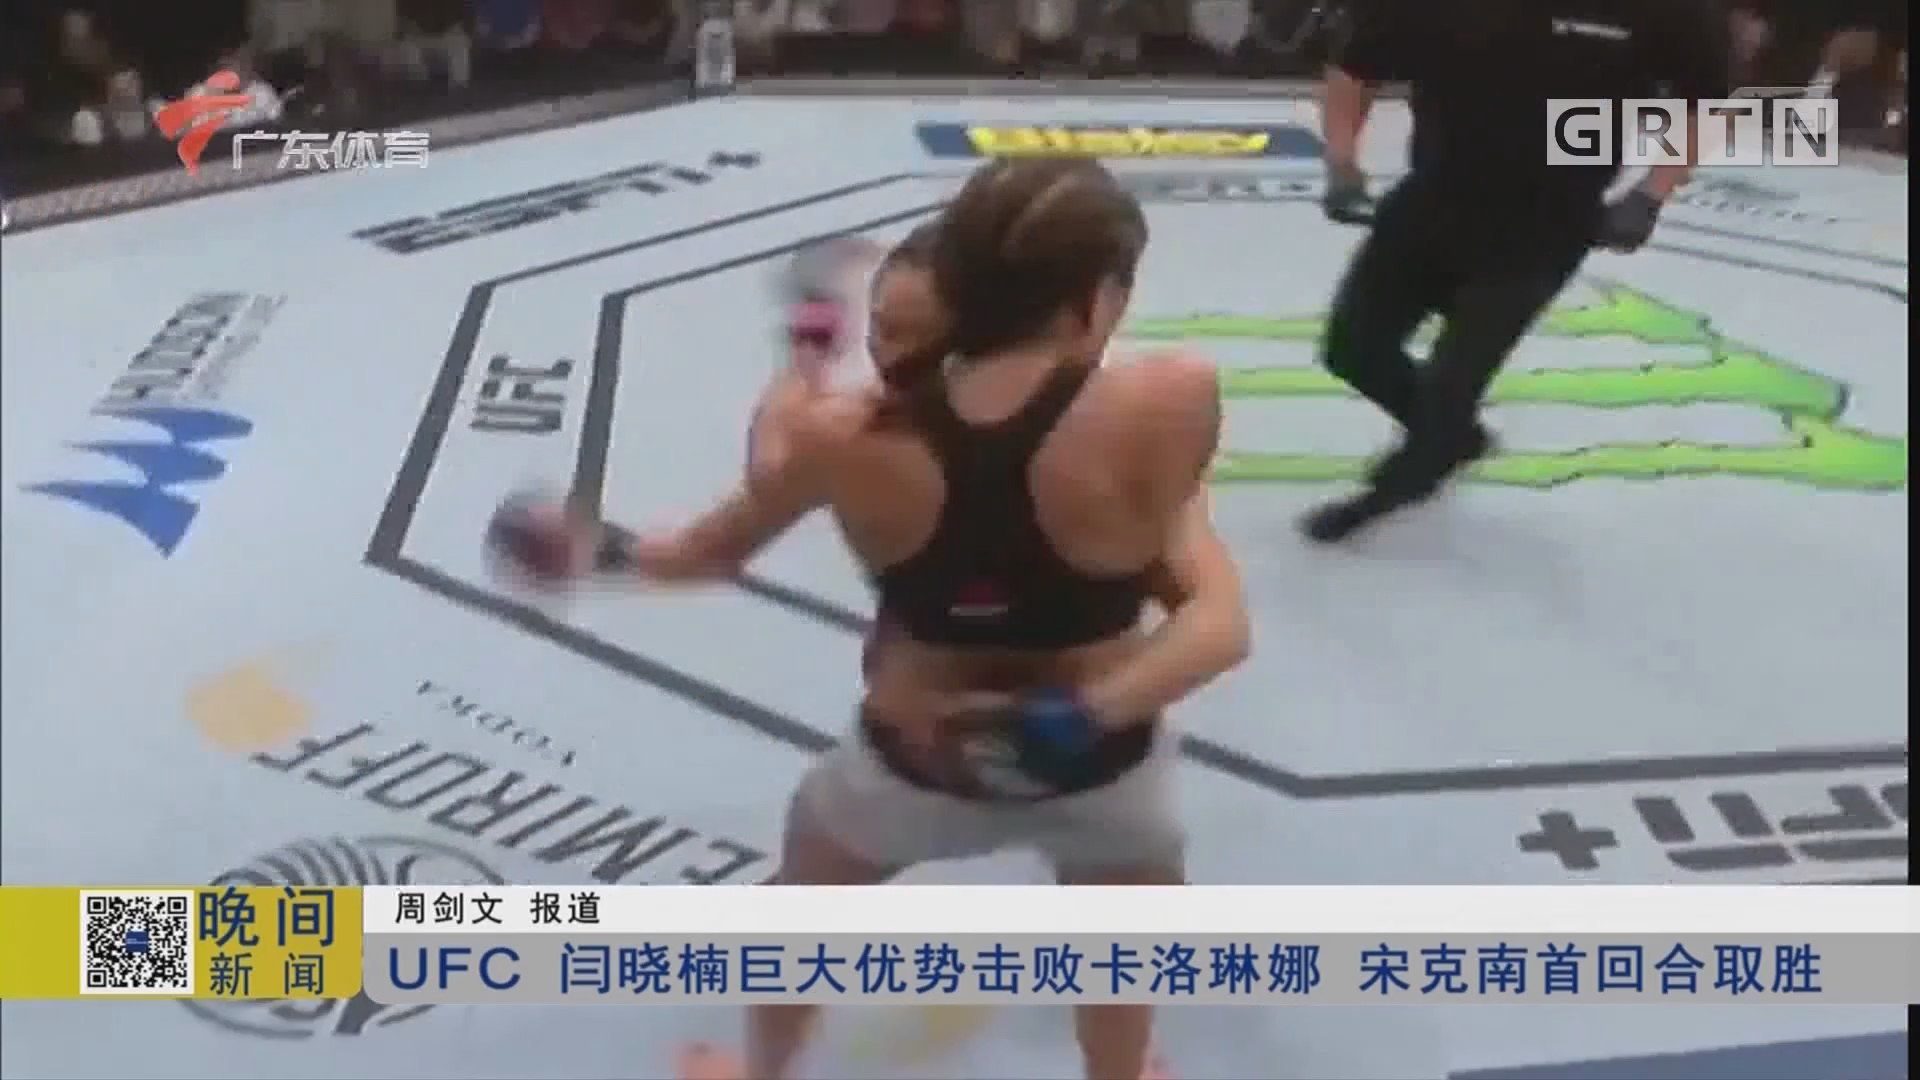 UFC 闫晓楠巨大优势击败卡洛琳娜 宋克南首回合取胜